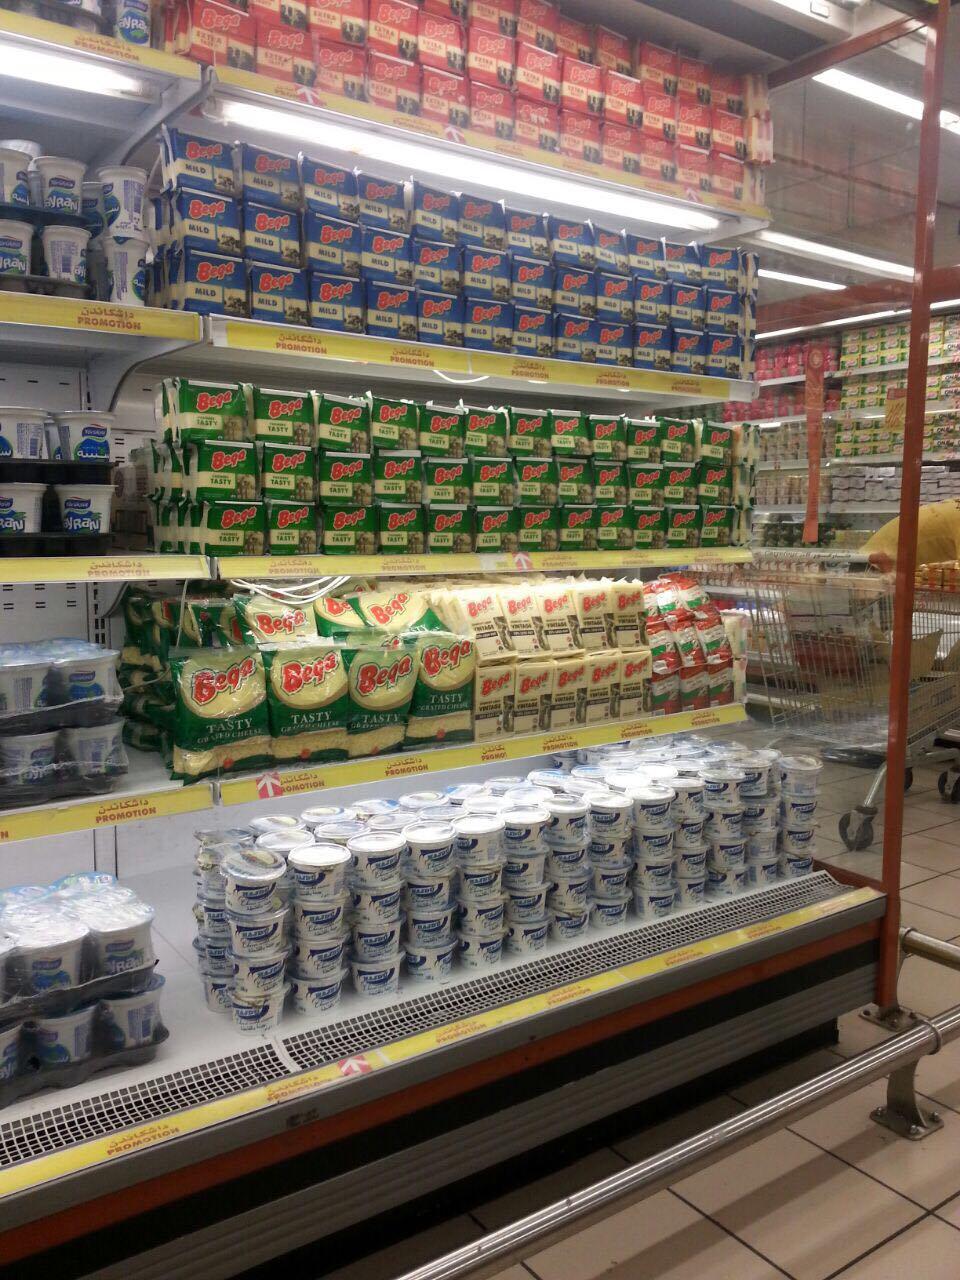 Rassalain Products - Supermarkets